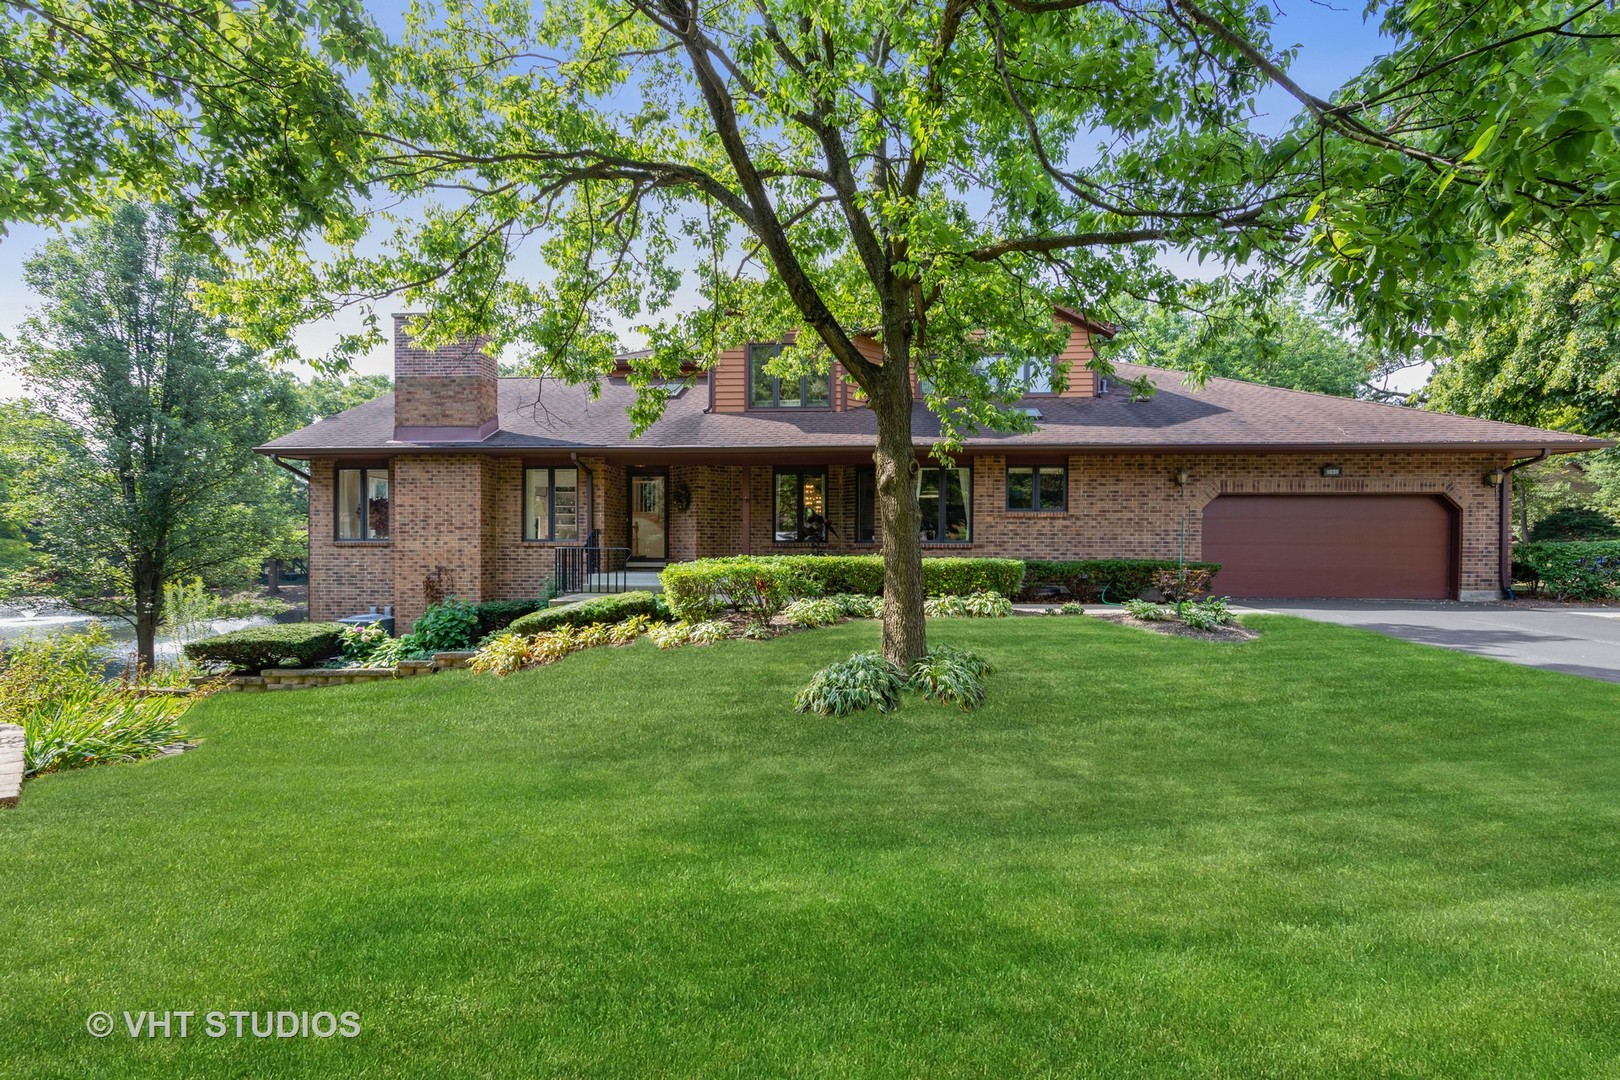 1039 Braemoor Drive, Downers Grove, Illinois